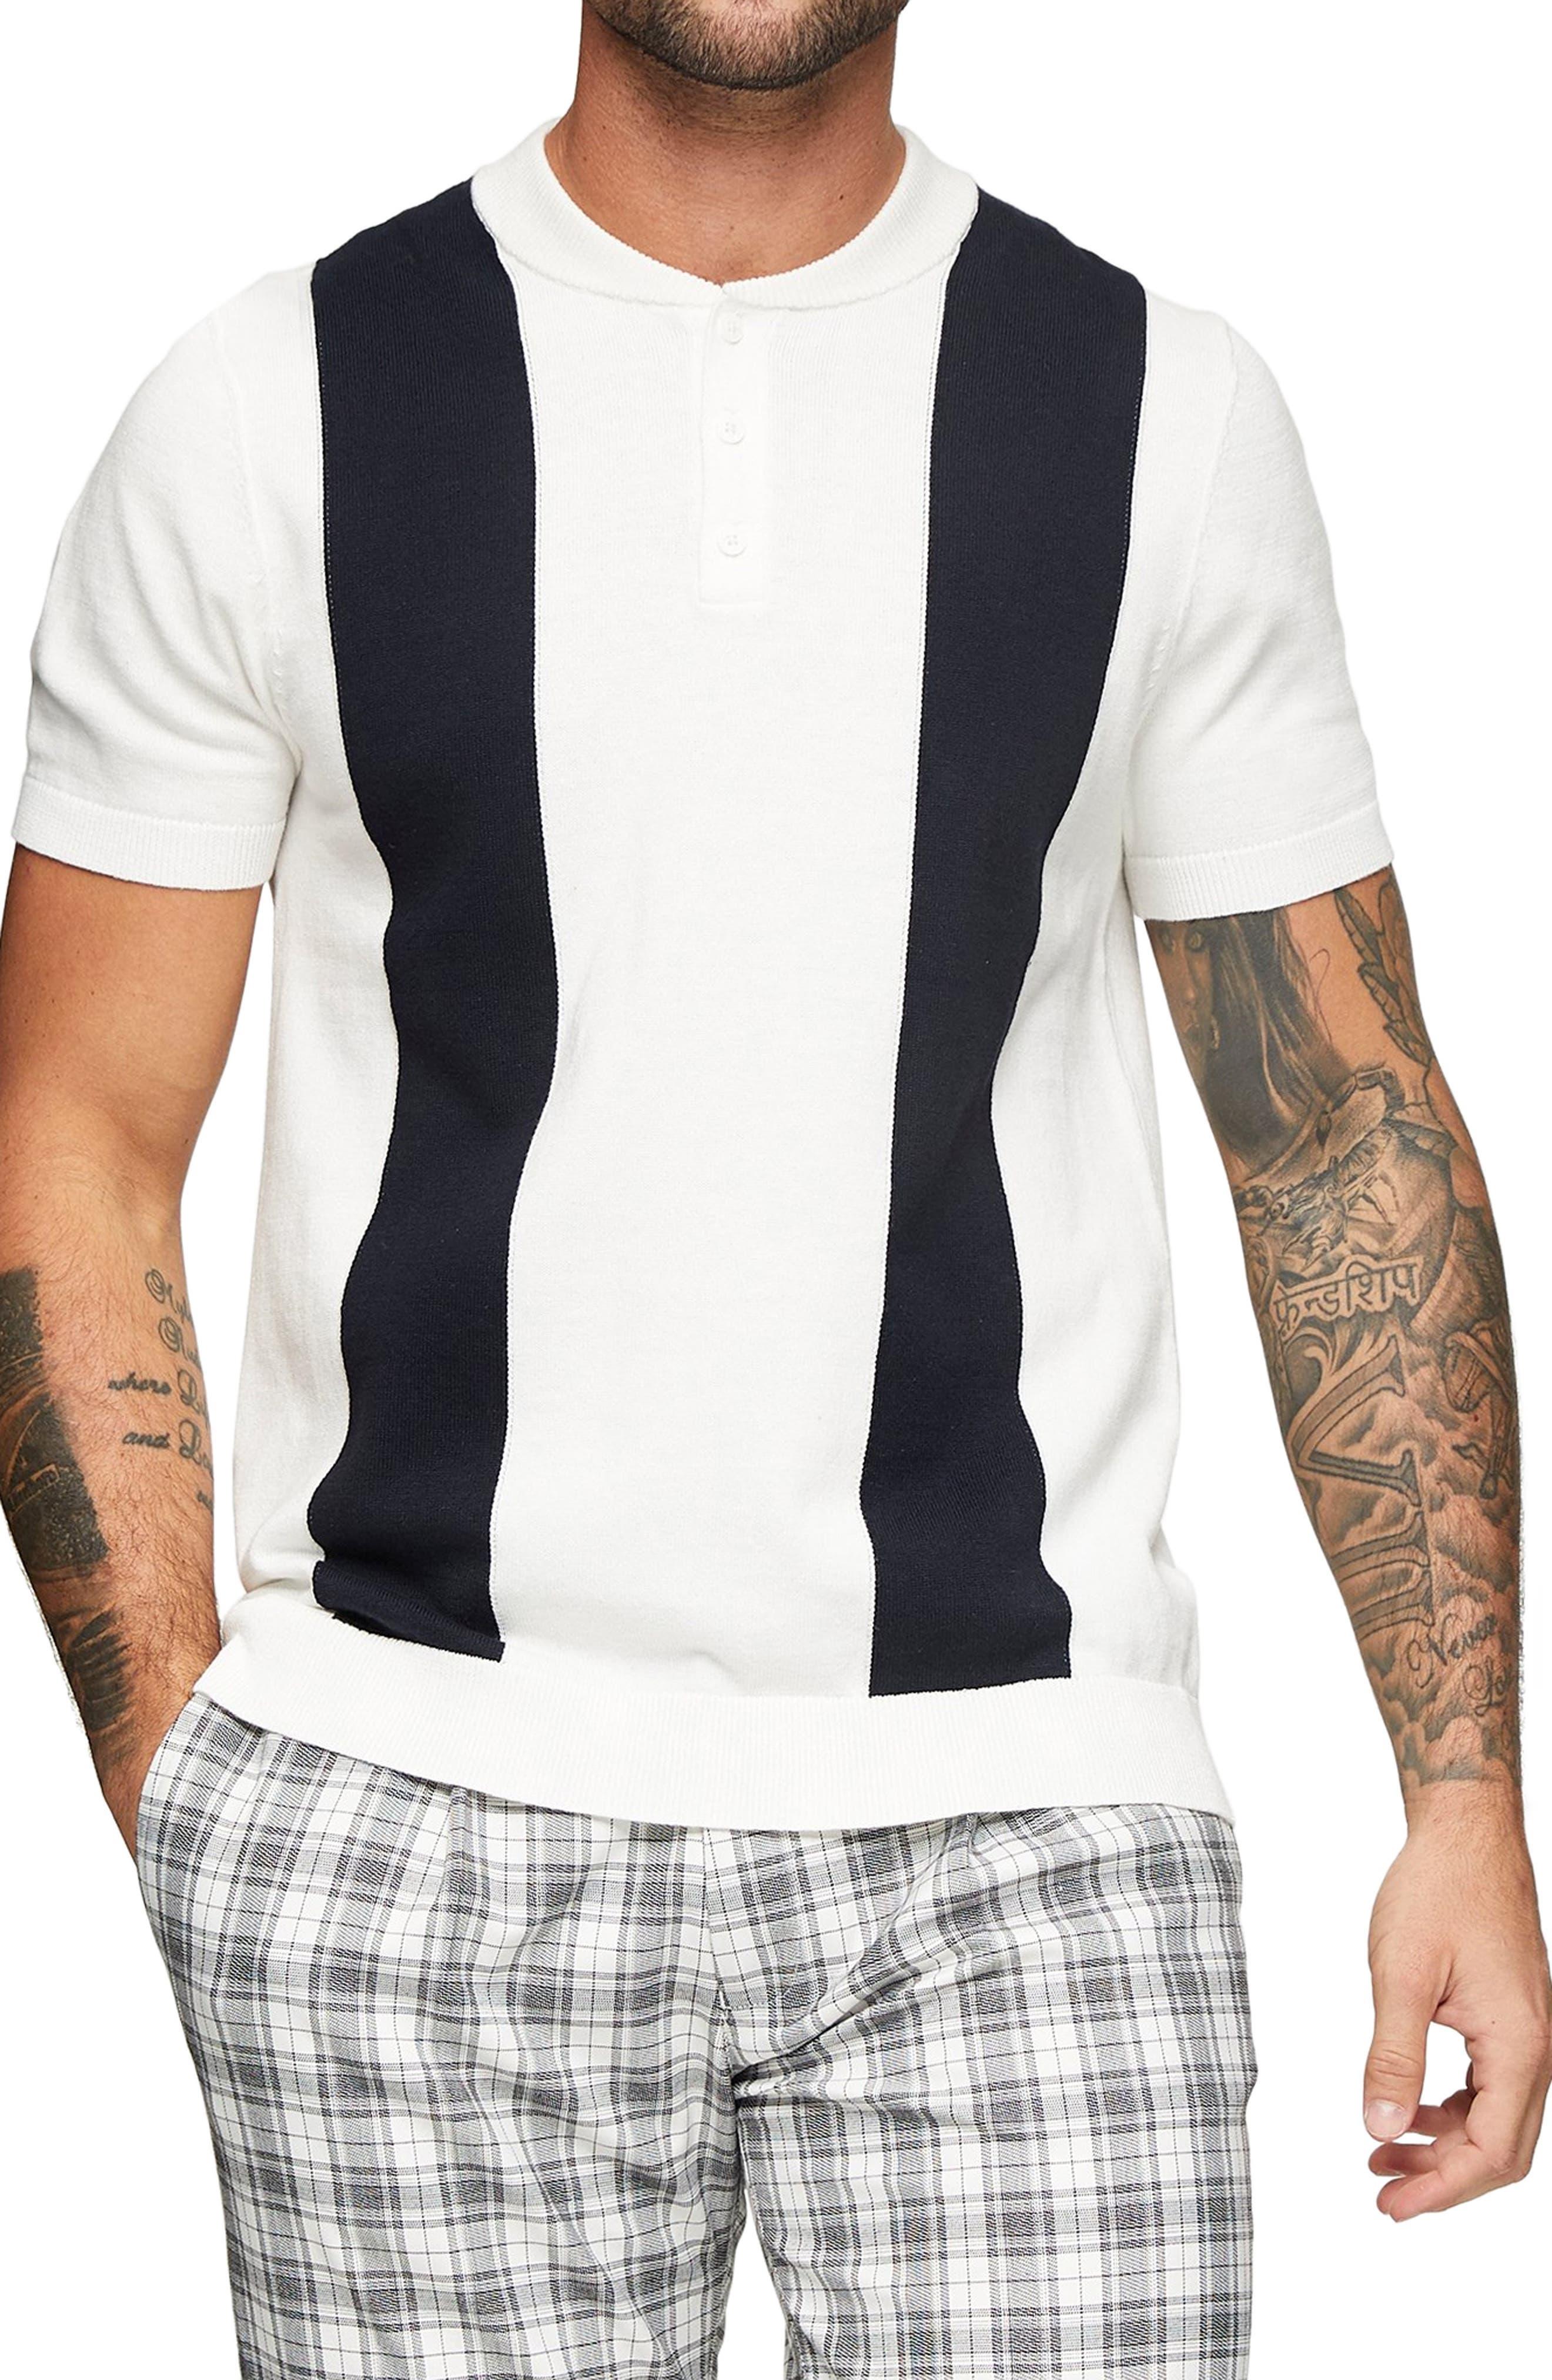 1960s Mens Shirts | 60s Mod Shirts, Hippie Shirts Mens Topman Baseball Stitch Polo Shirt Size Medium - White $45.00 AT vintagedancer.com